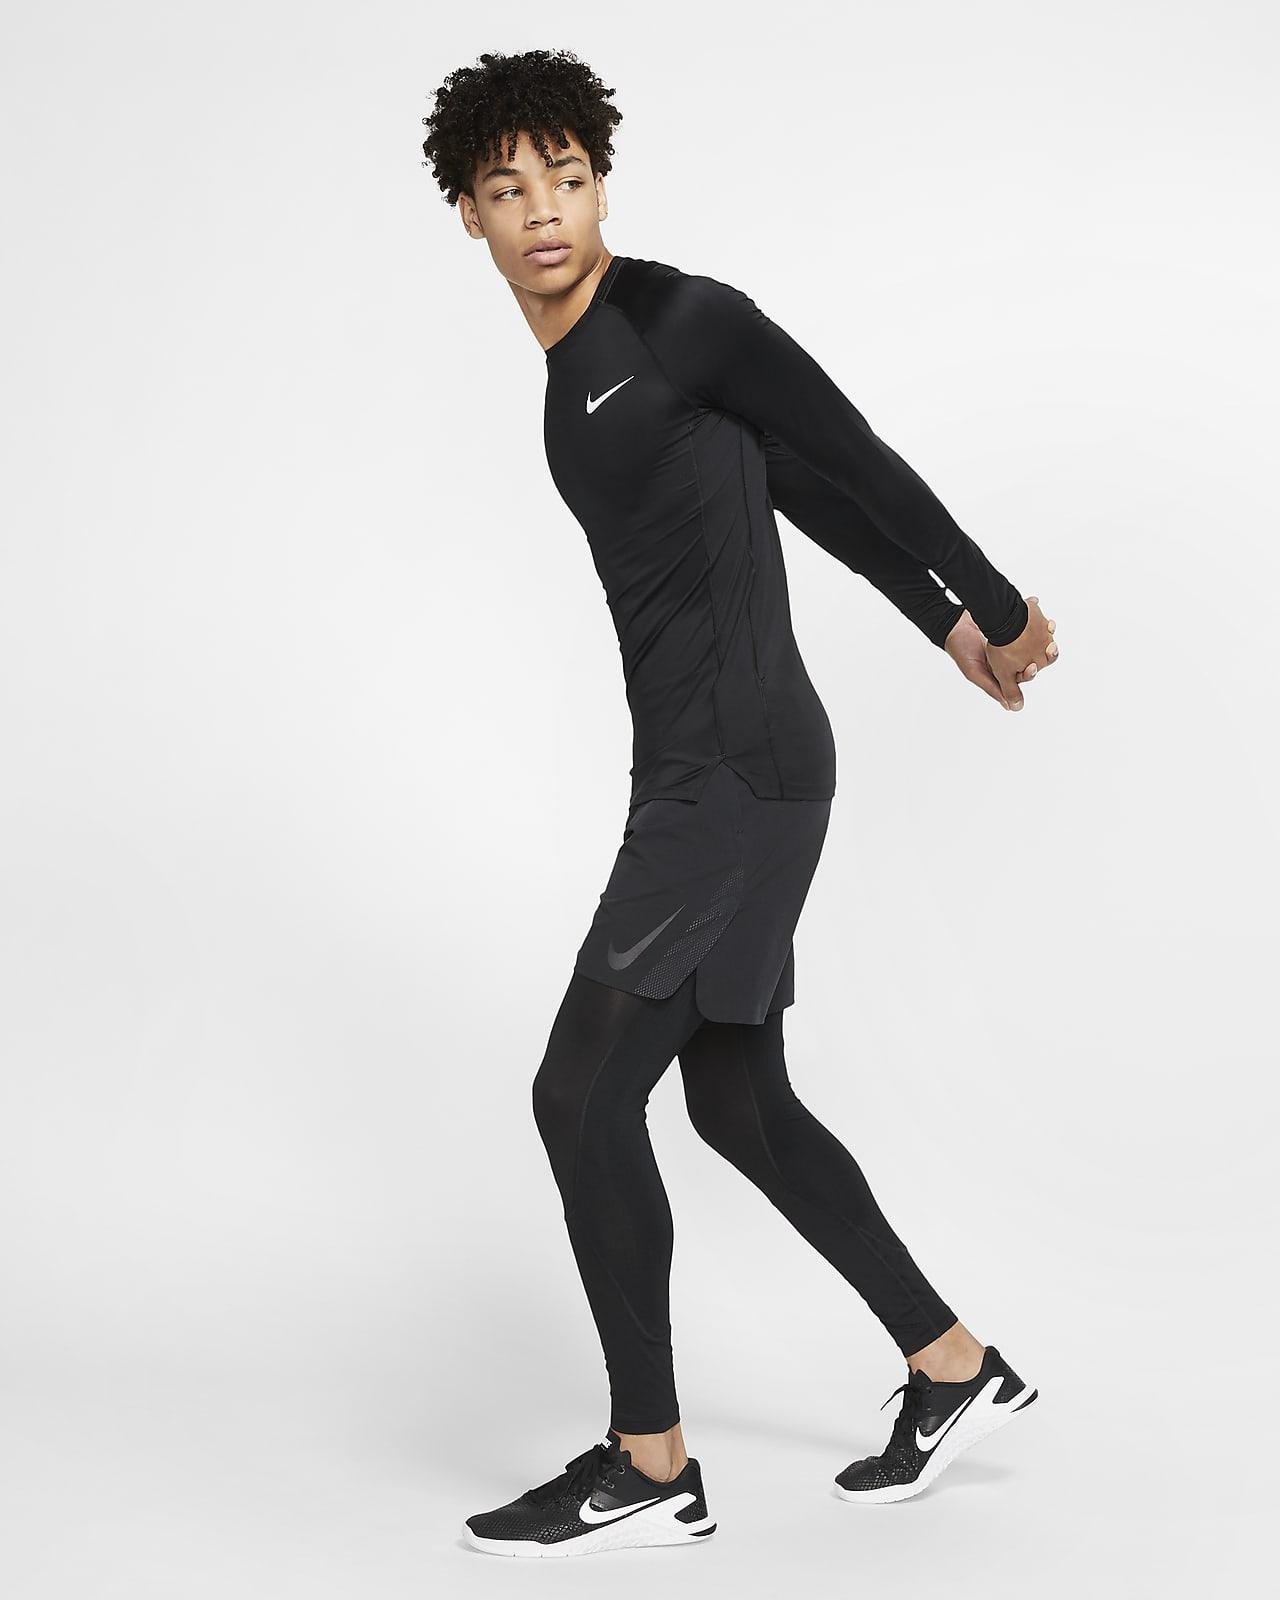 Nike Pro Men's Long-Sleeve Top. Nike SG